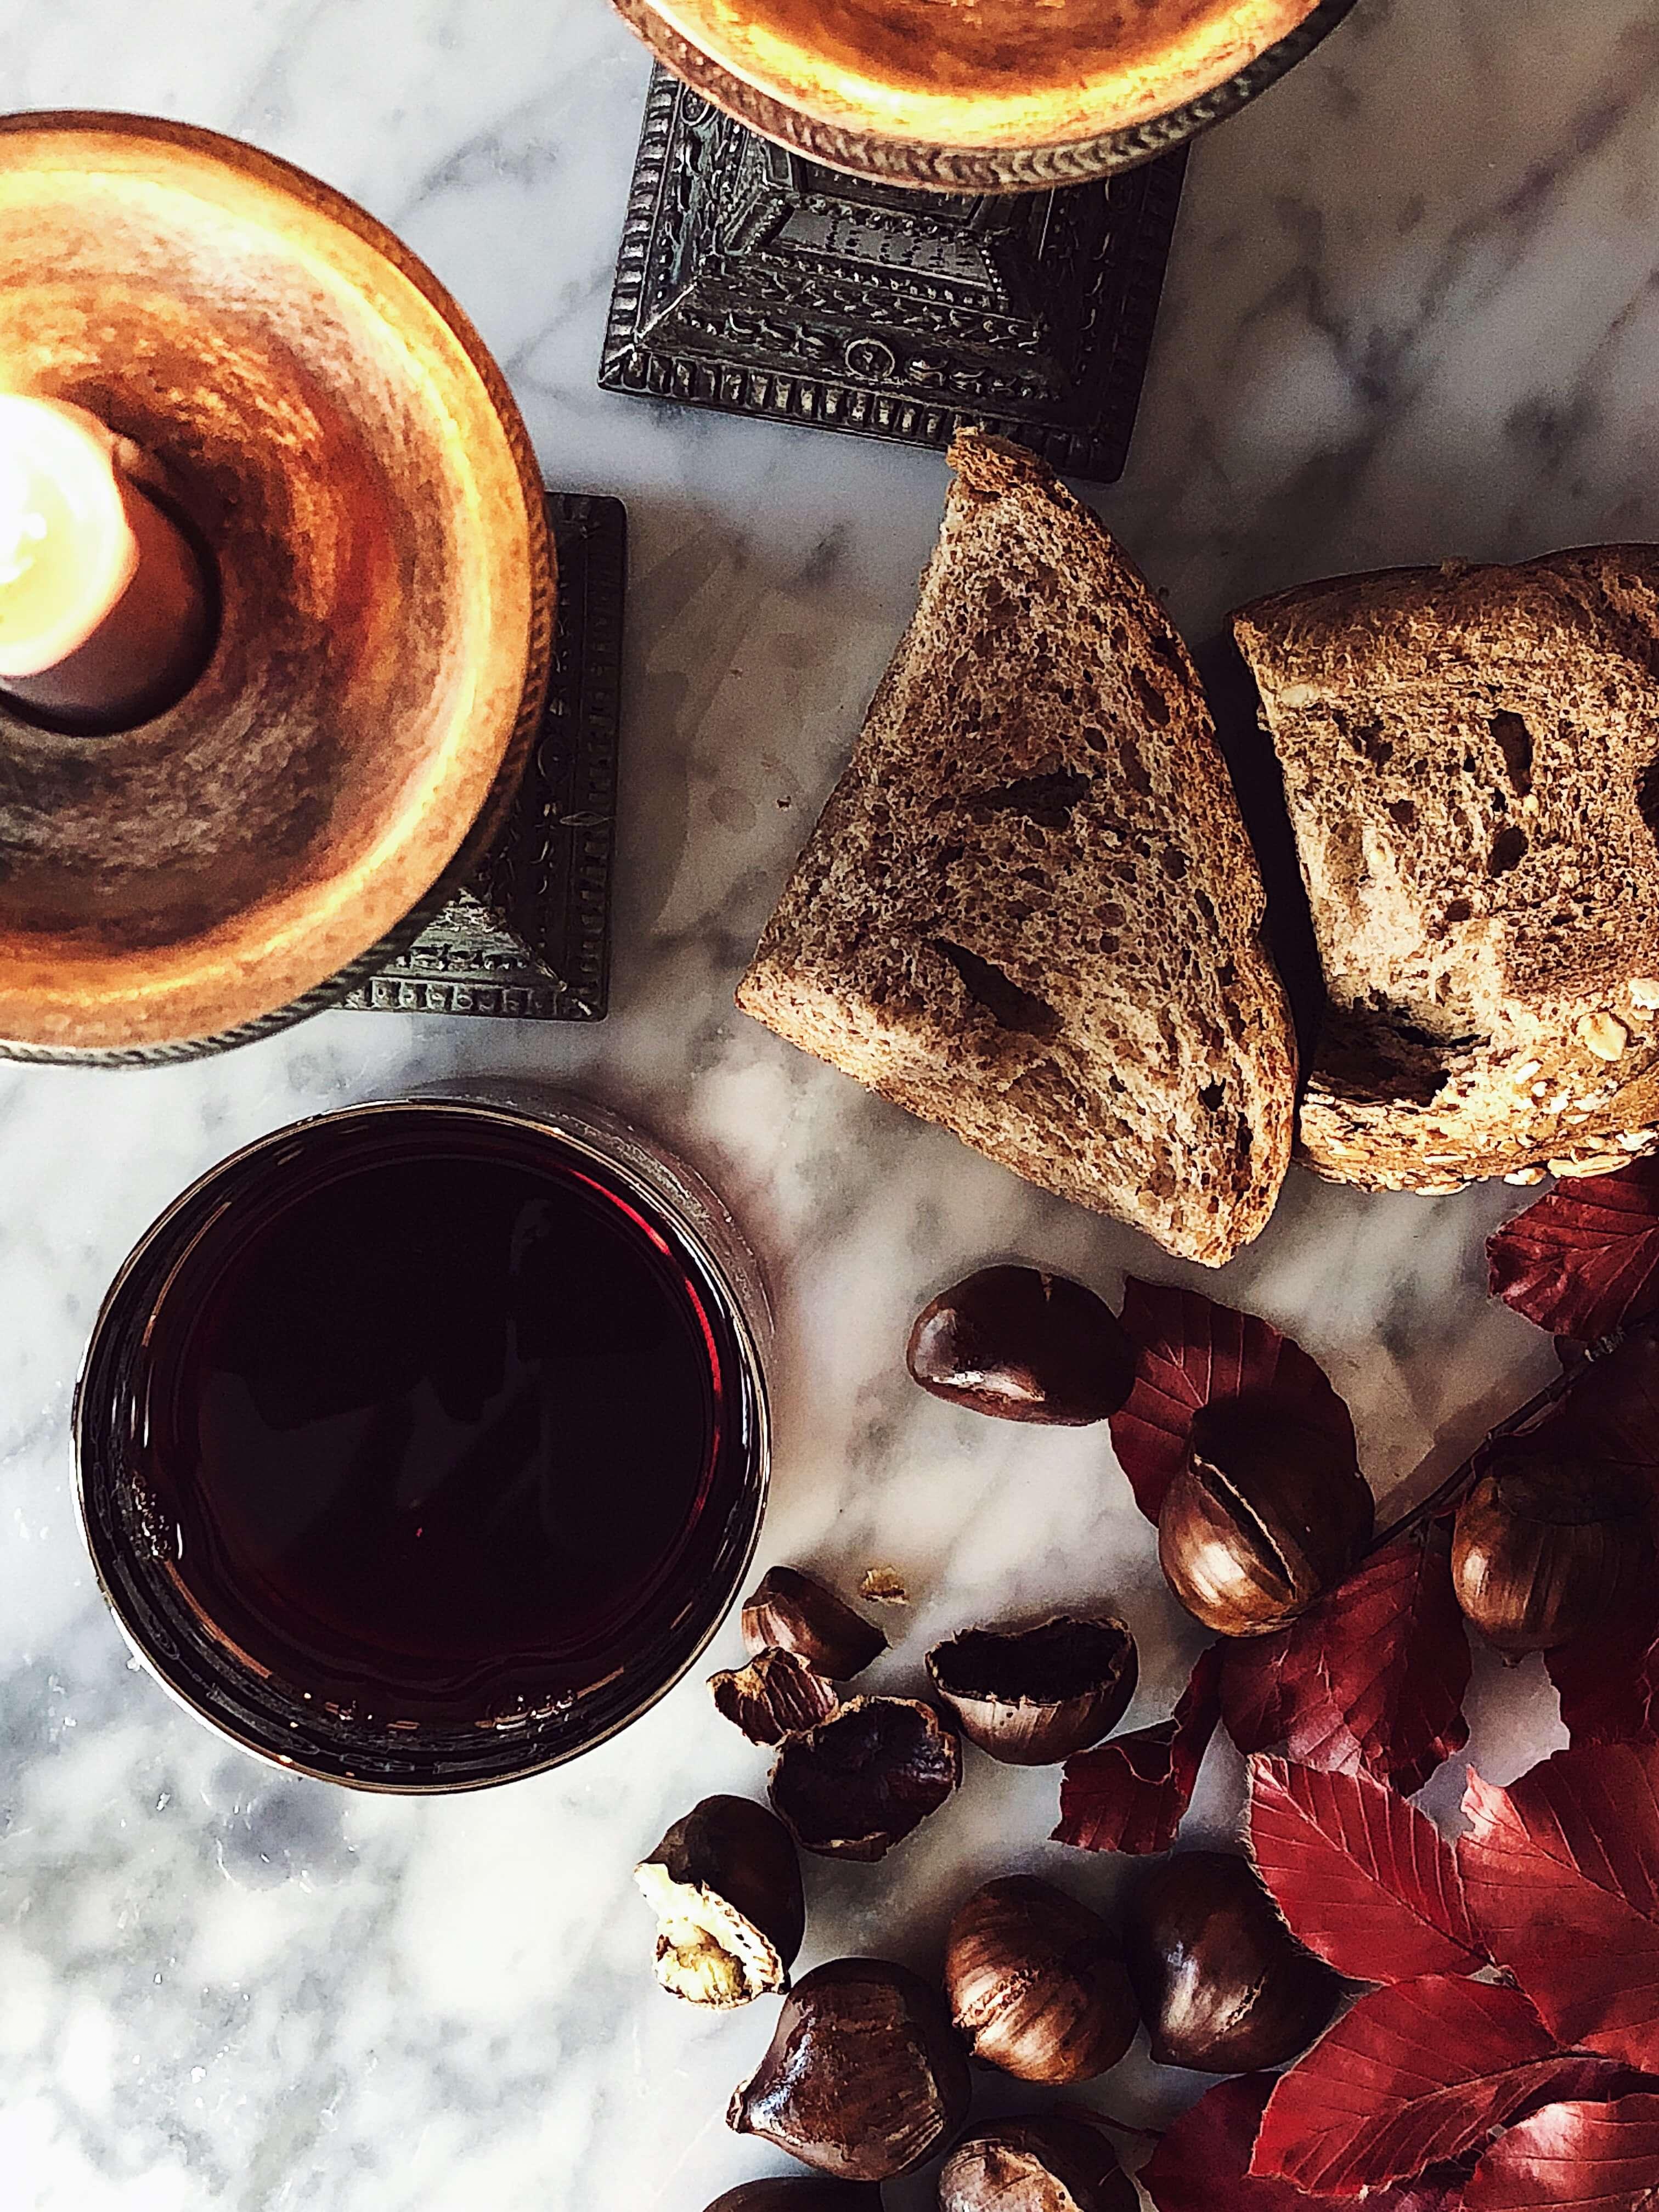 Italian cuisine magazine: san Martino in Italy #thegourmetmag #italy